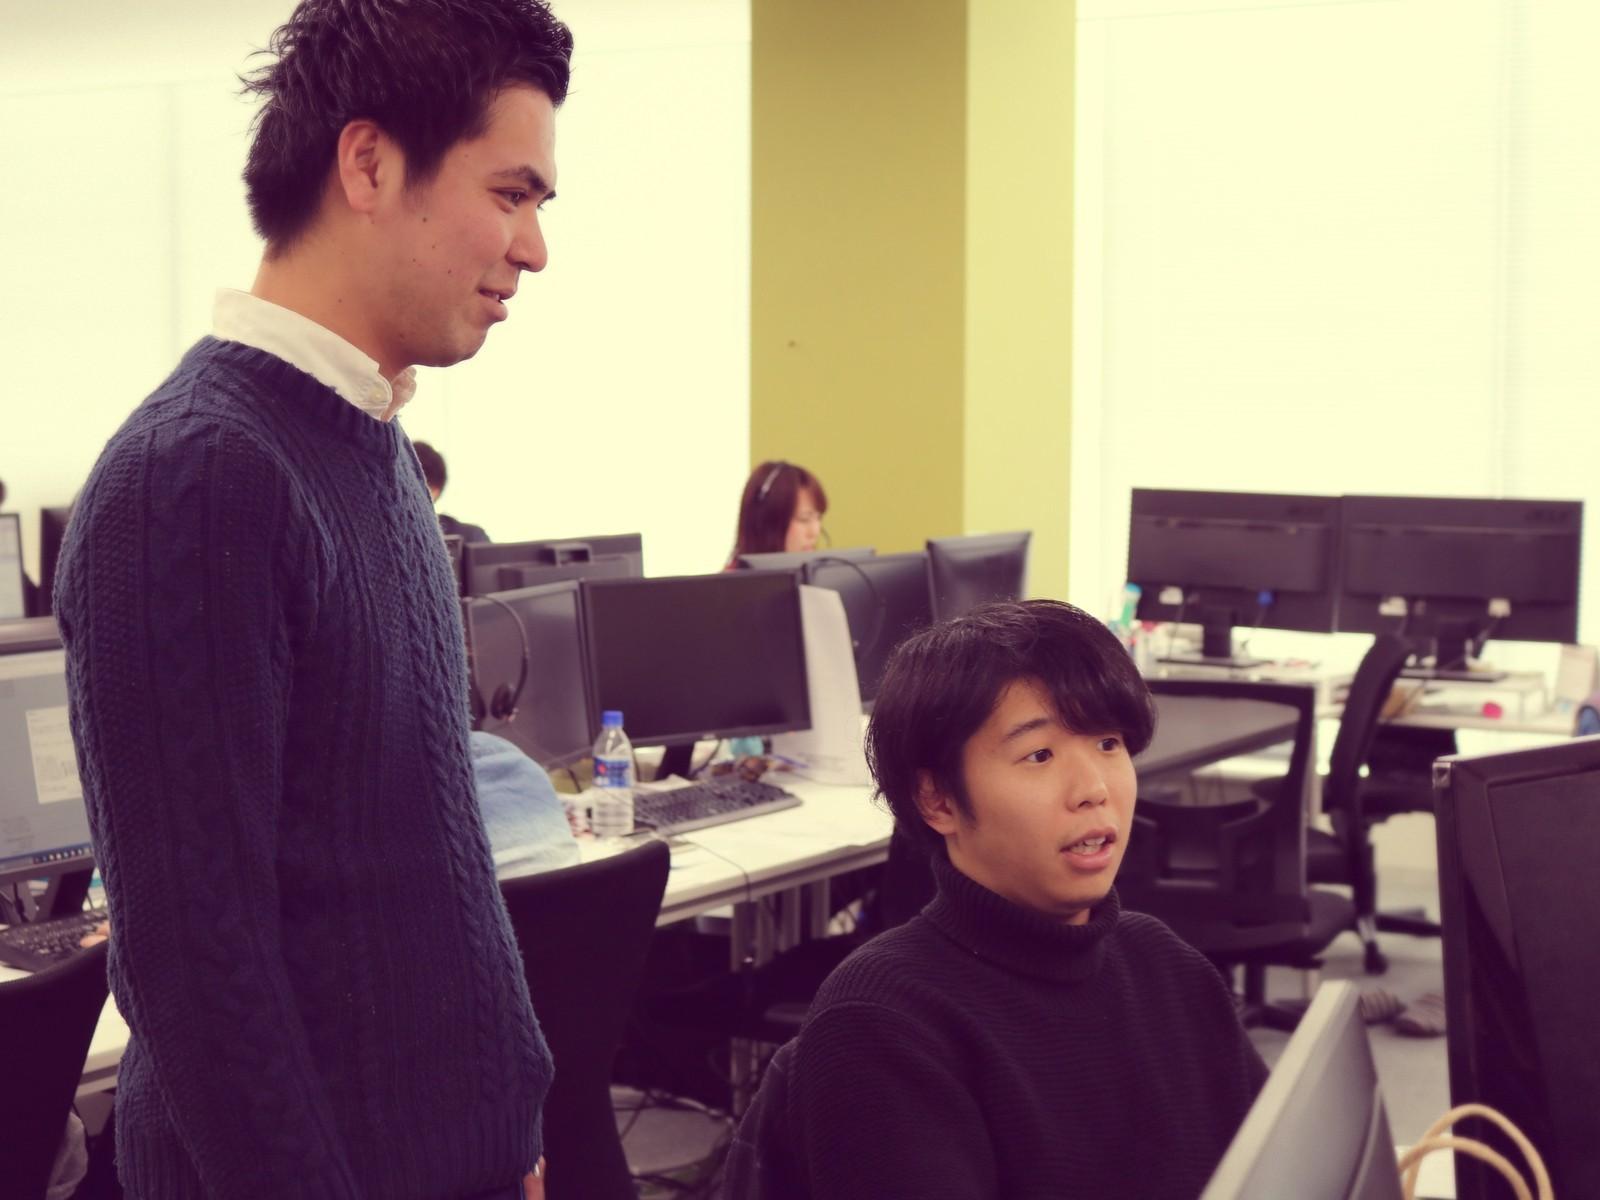 【Webエンジニア】自社メディアの開発 バックエンドエンジニア募集!